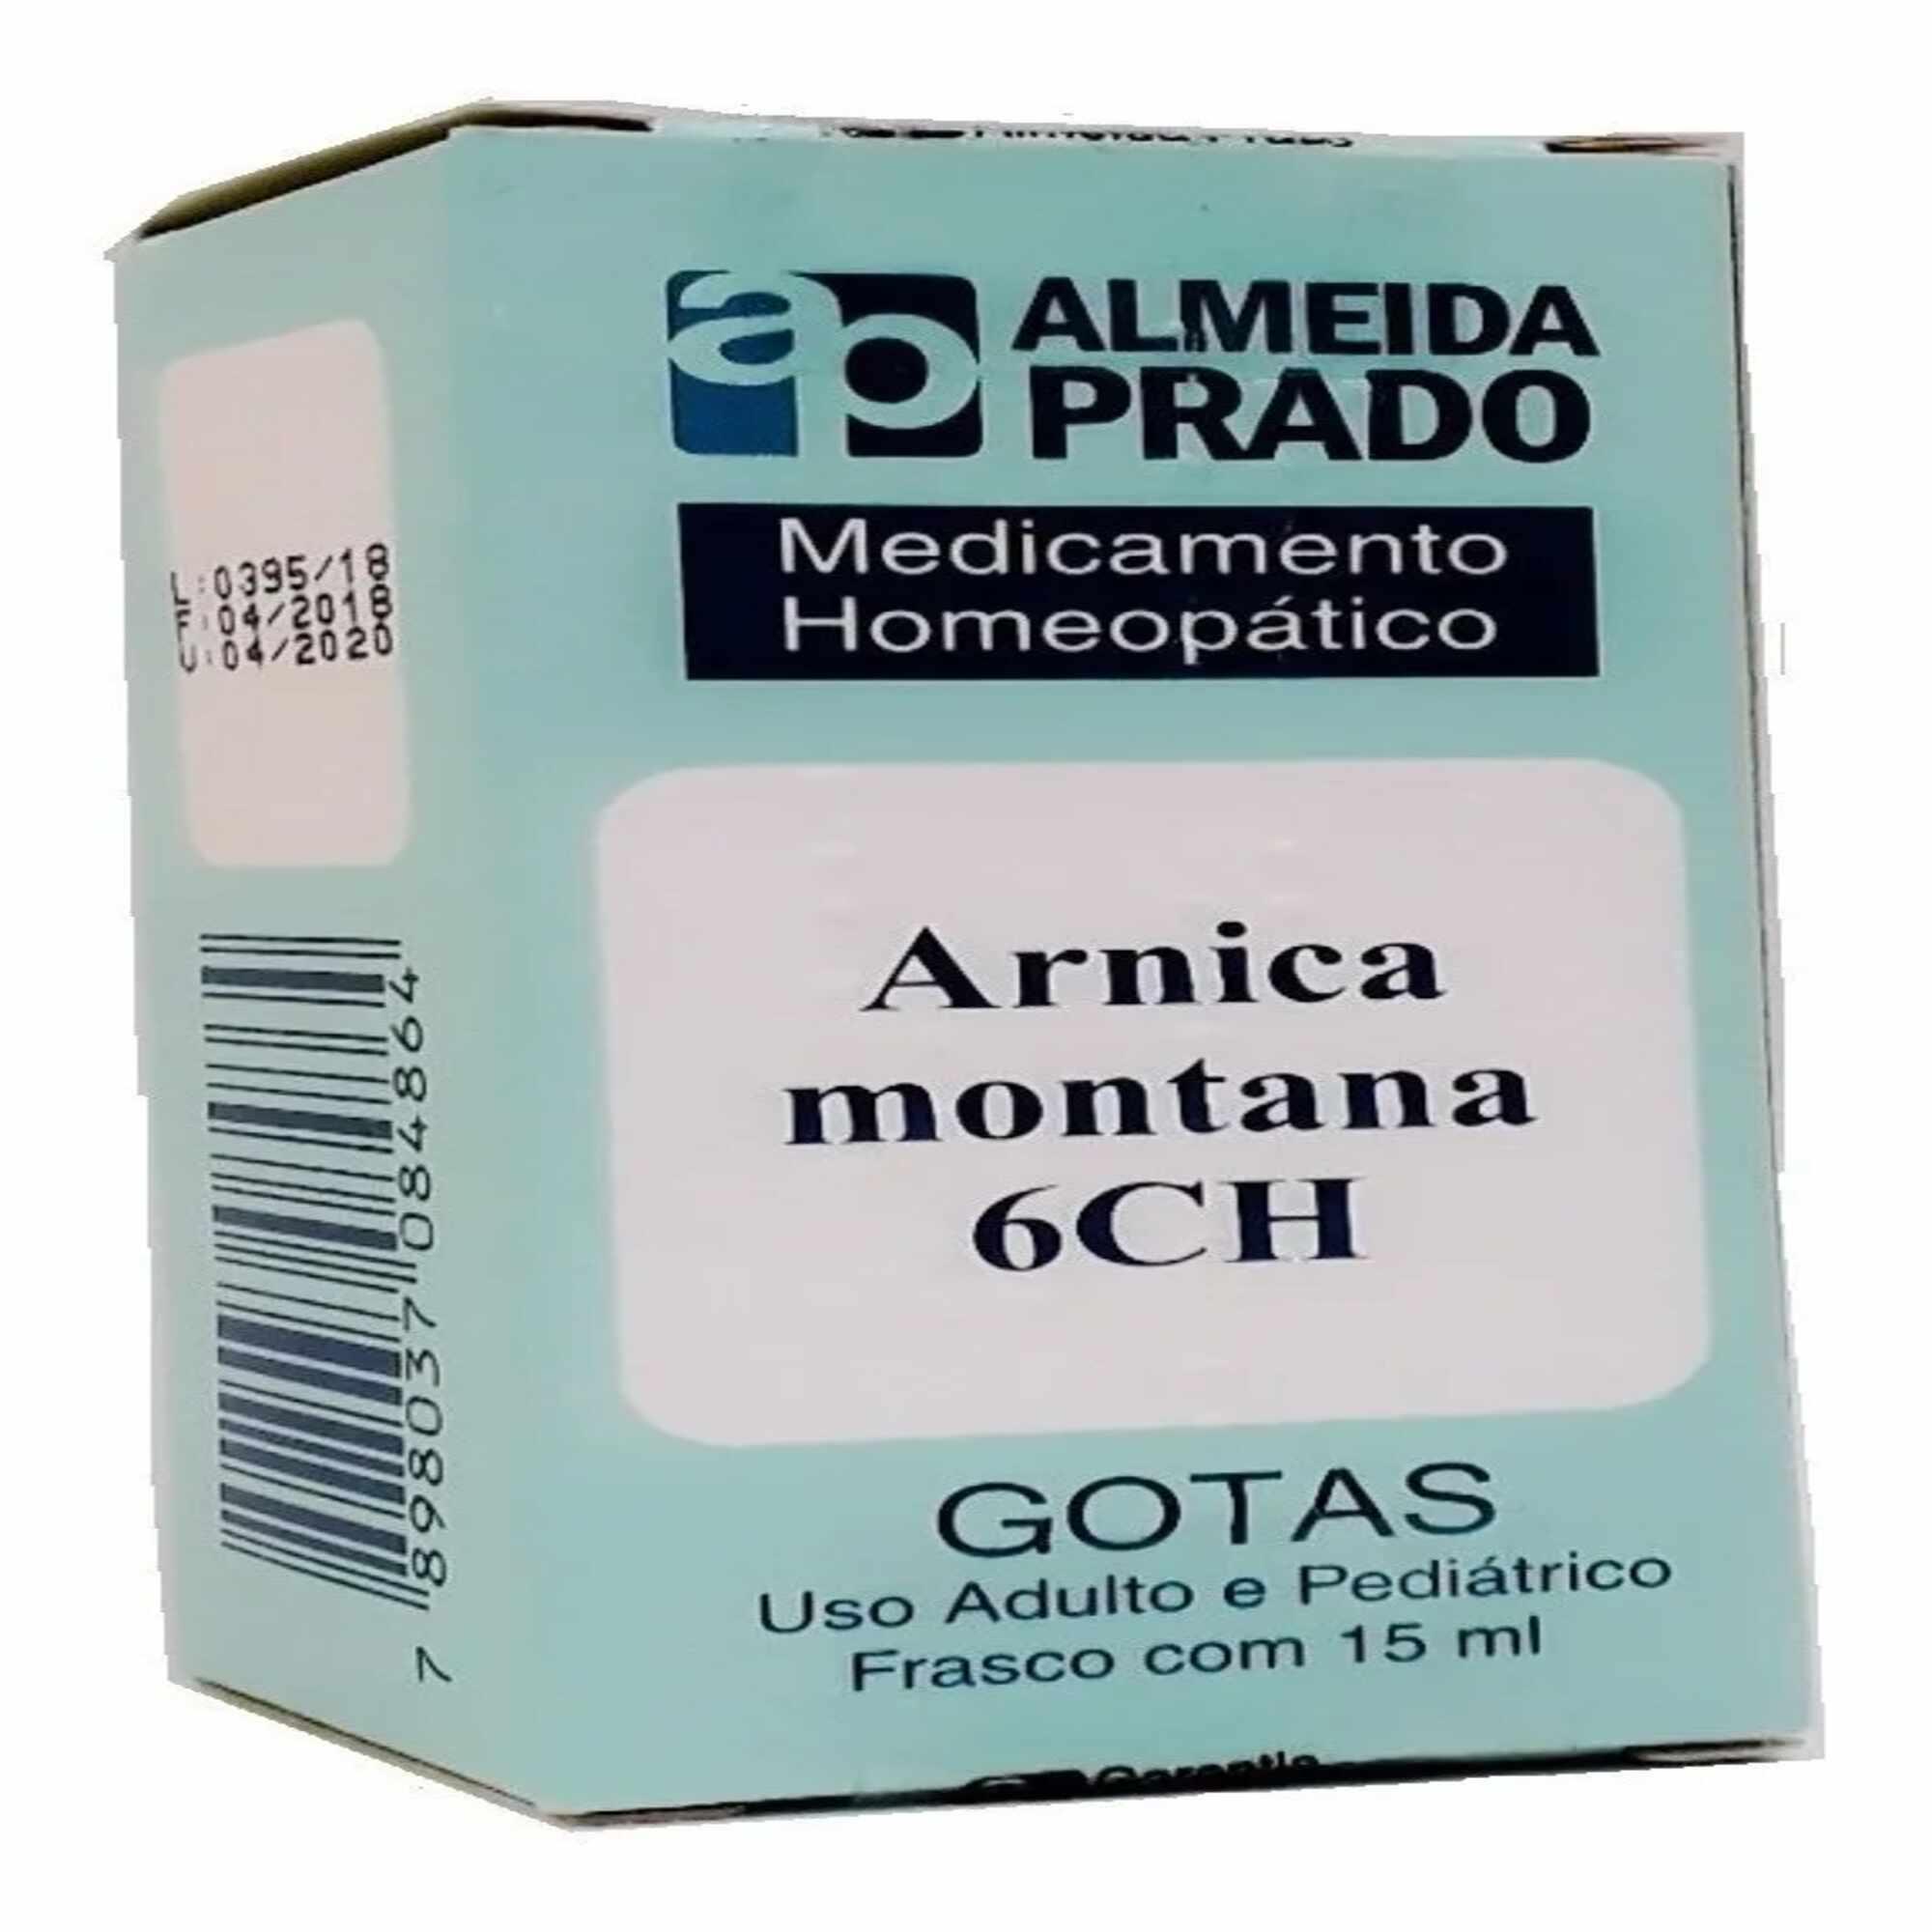 Arnica Montana 6Ch Líquido Almeida Pradro